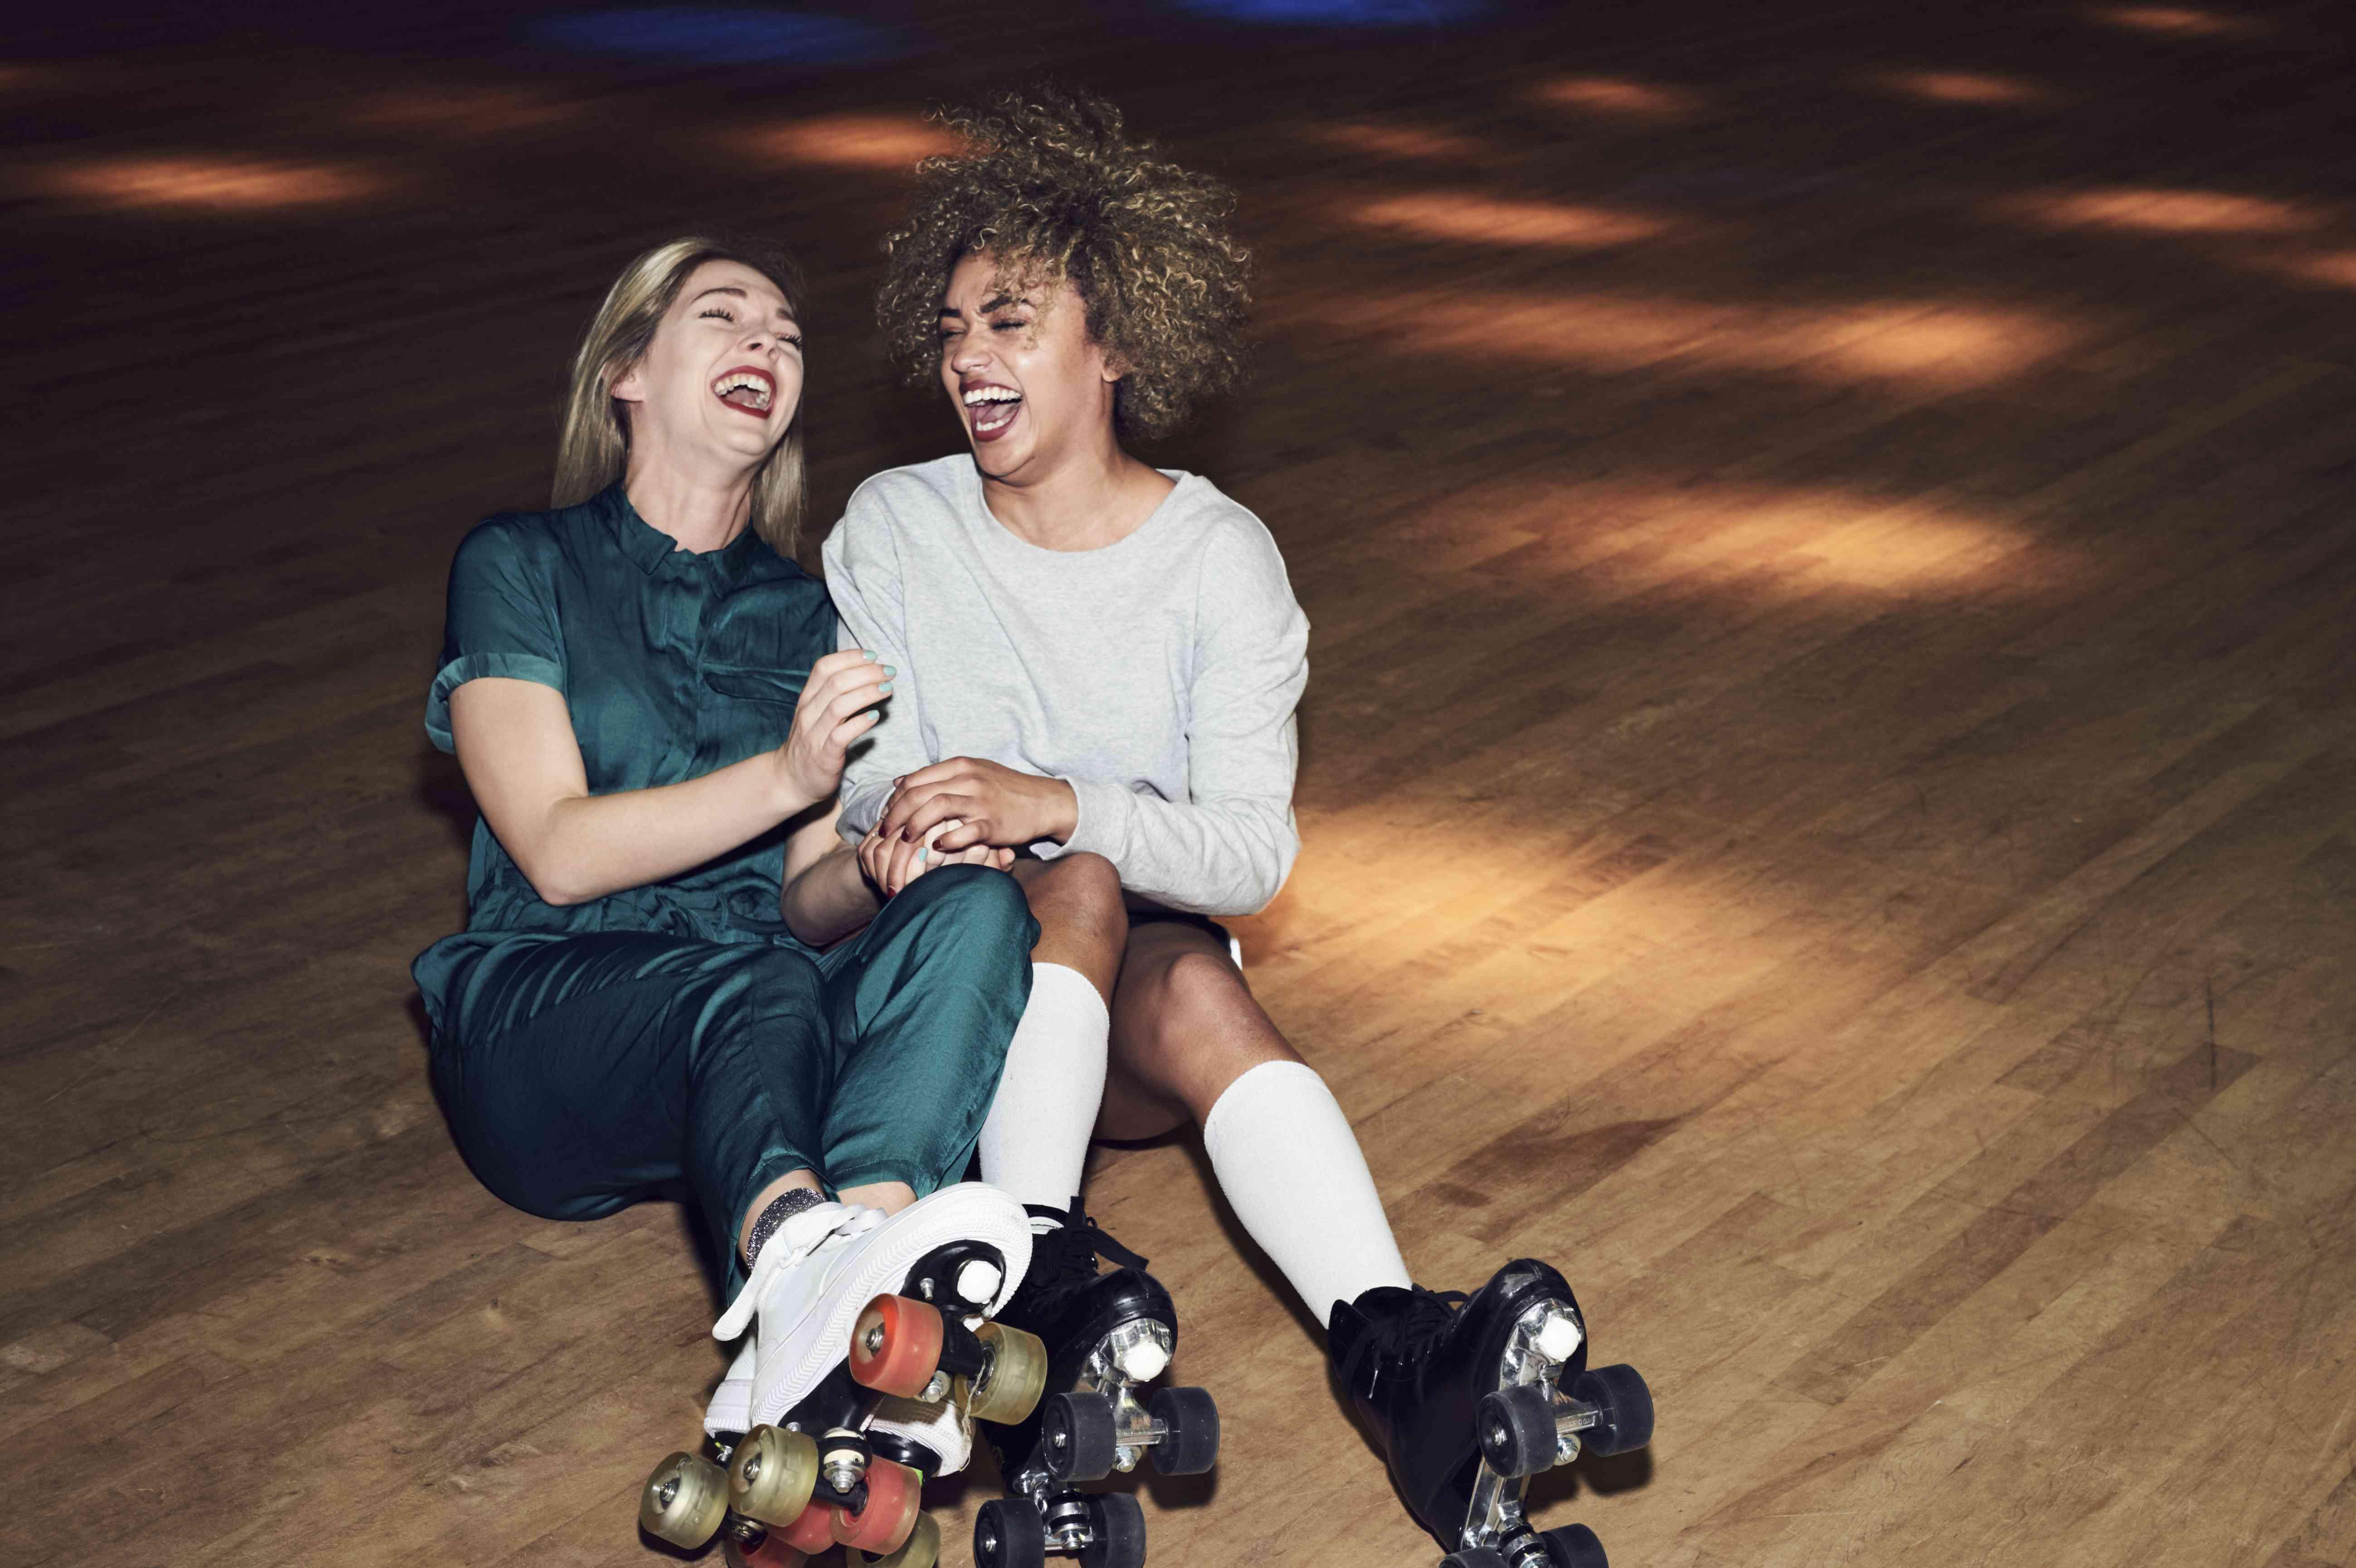 roller skating friends